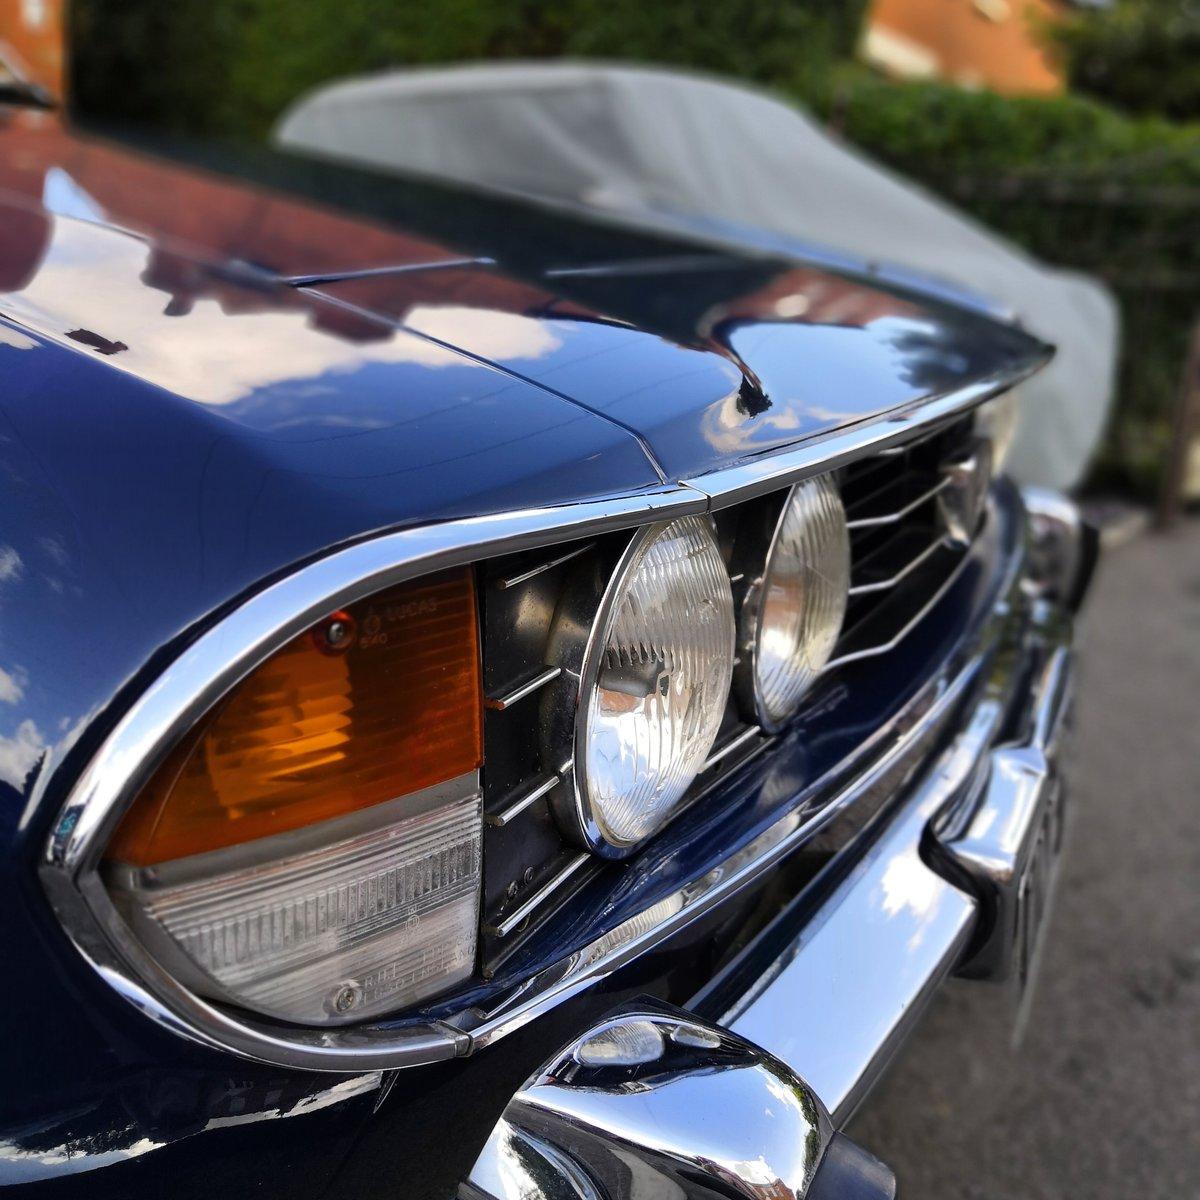 1972 Triumph Stag V8 (original) Sapphire Blue For Sale (picture 3 of 6)